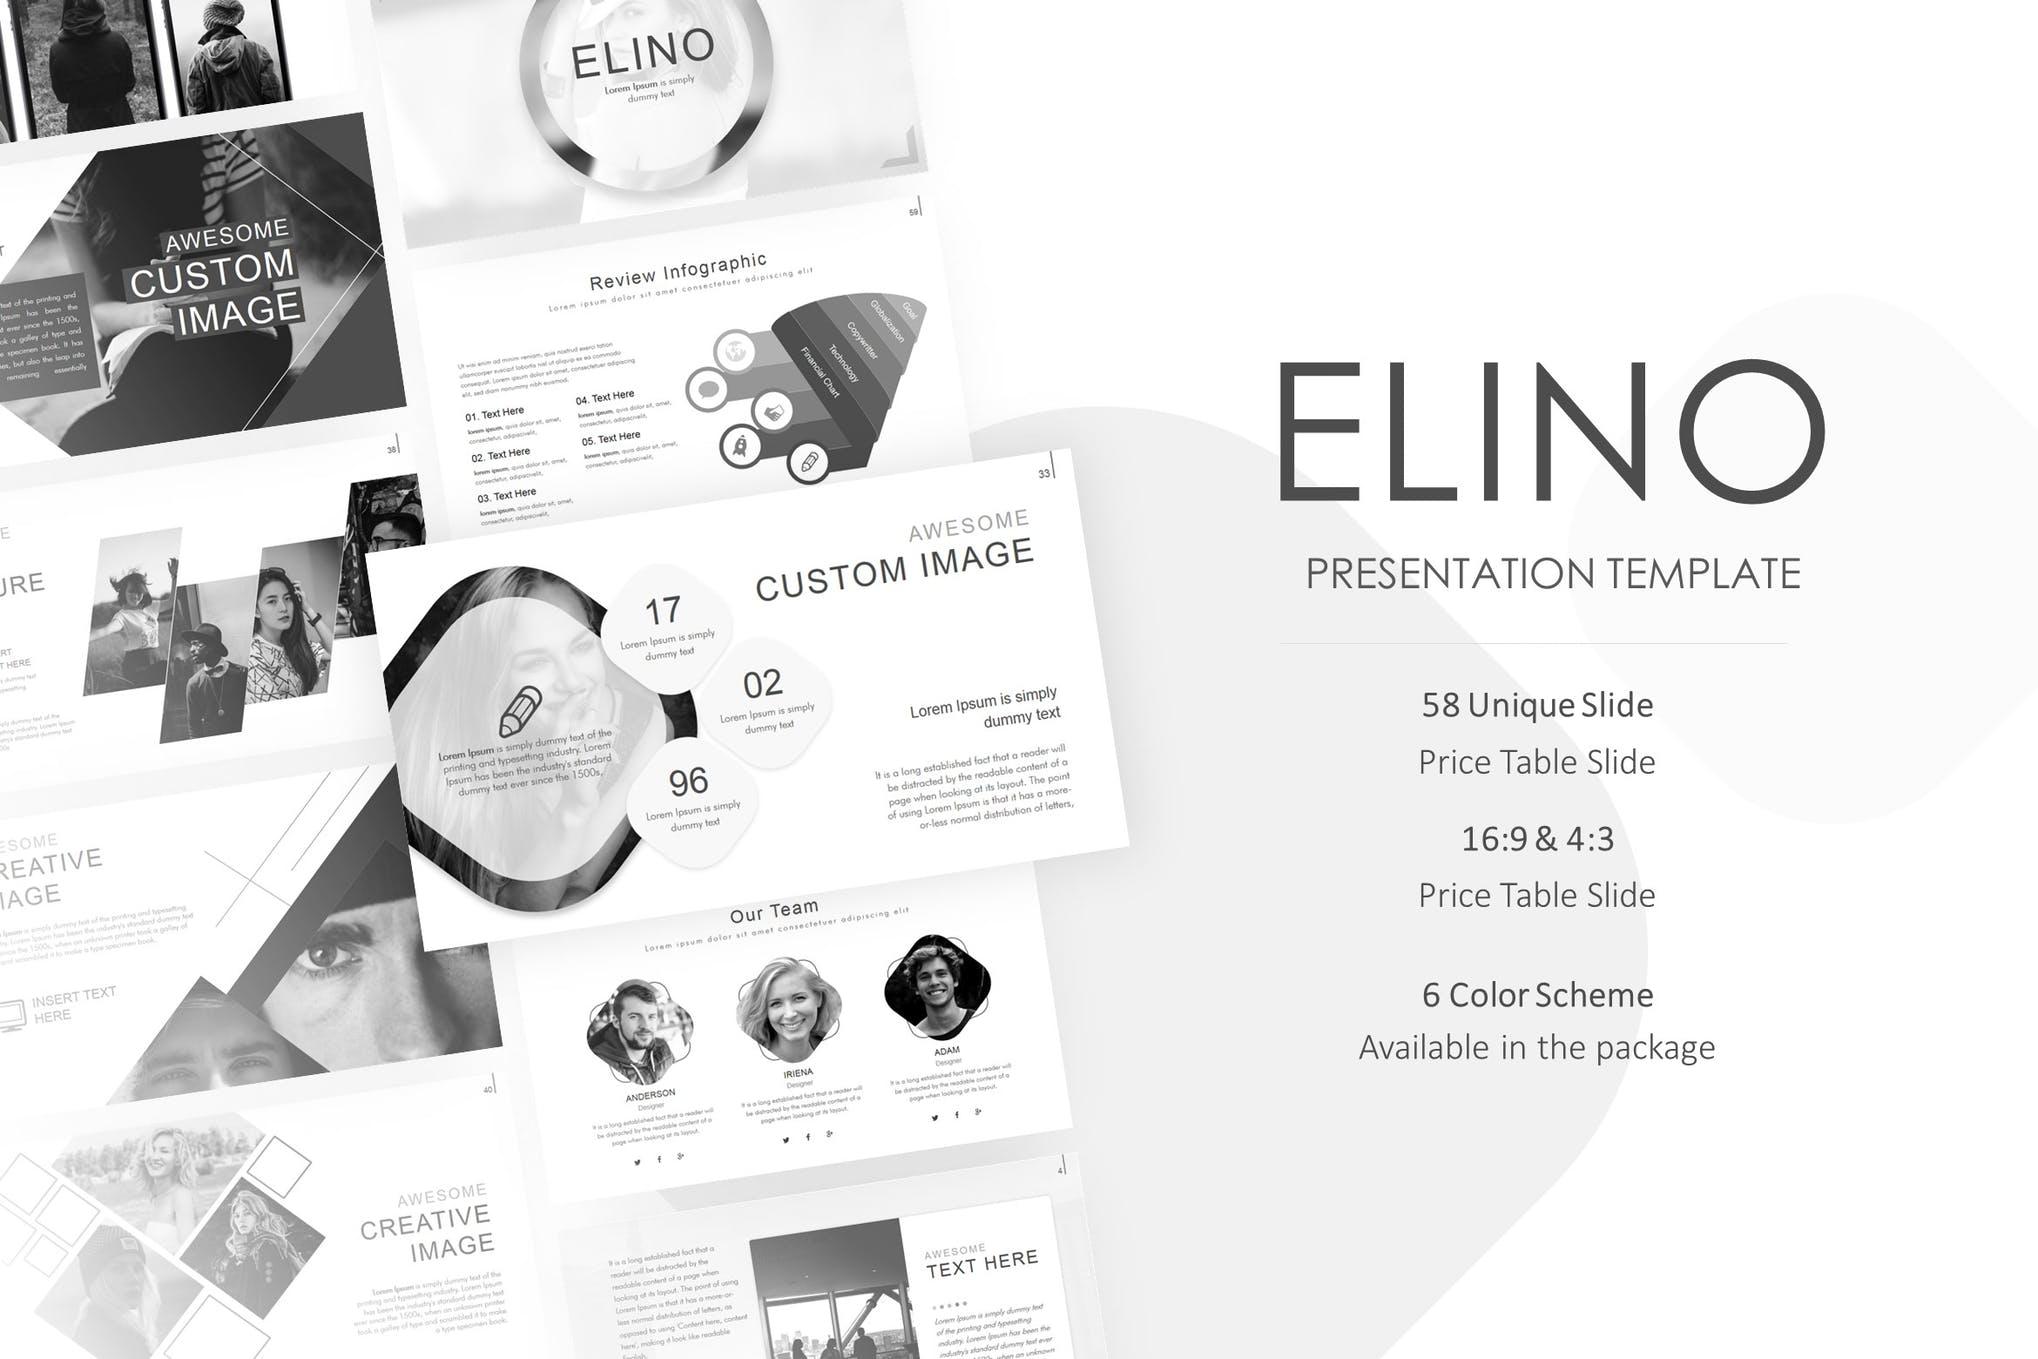 Elino Powerpoint Presentation Template